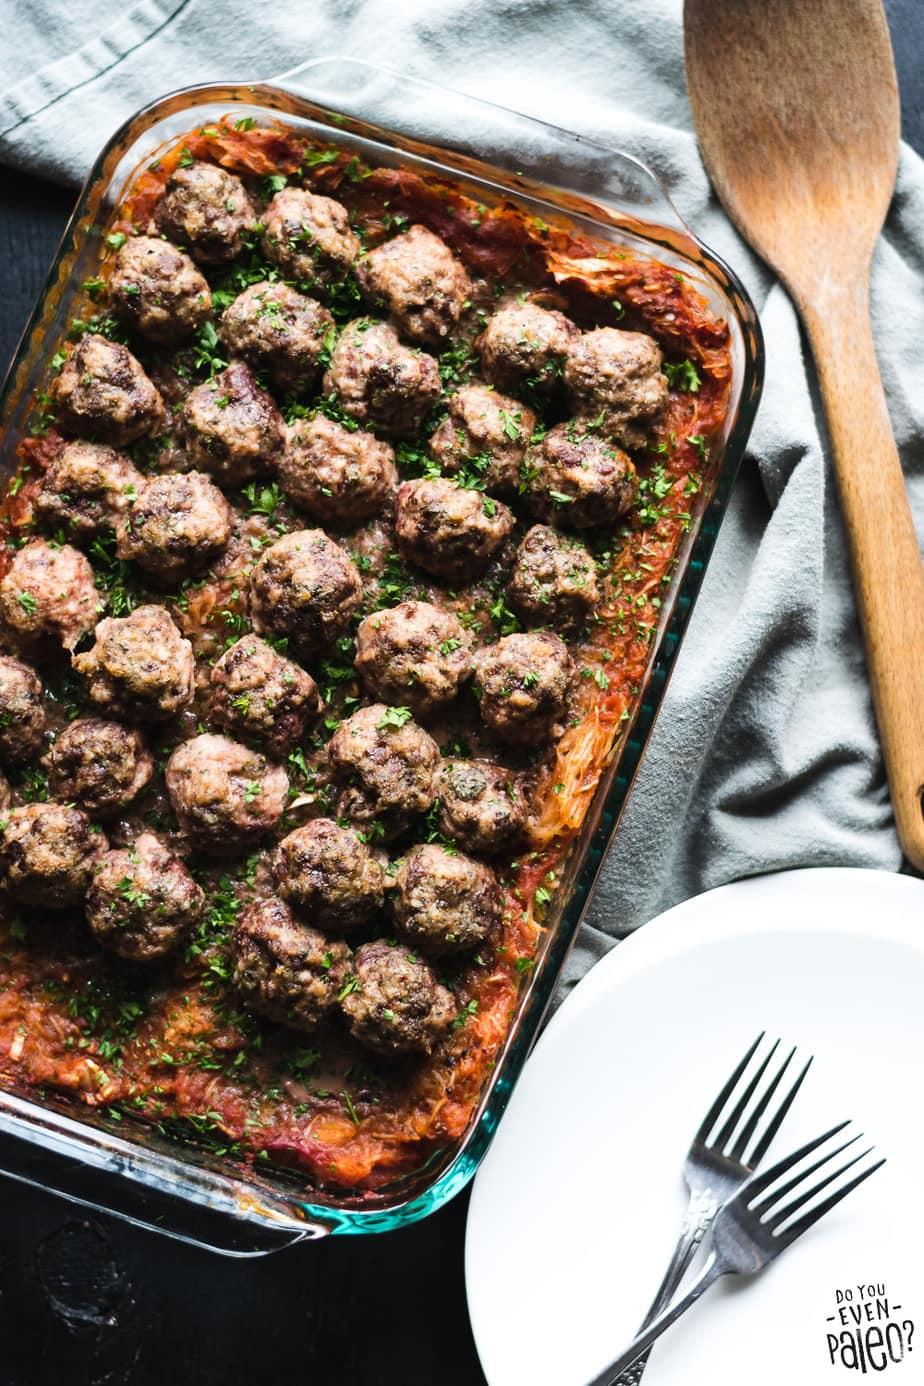 Paleo Spaghetti Squash & Meatball Casserole Recipe | DoYouEvenPaleo.net